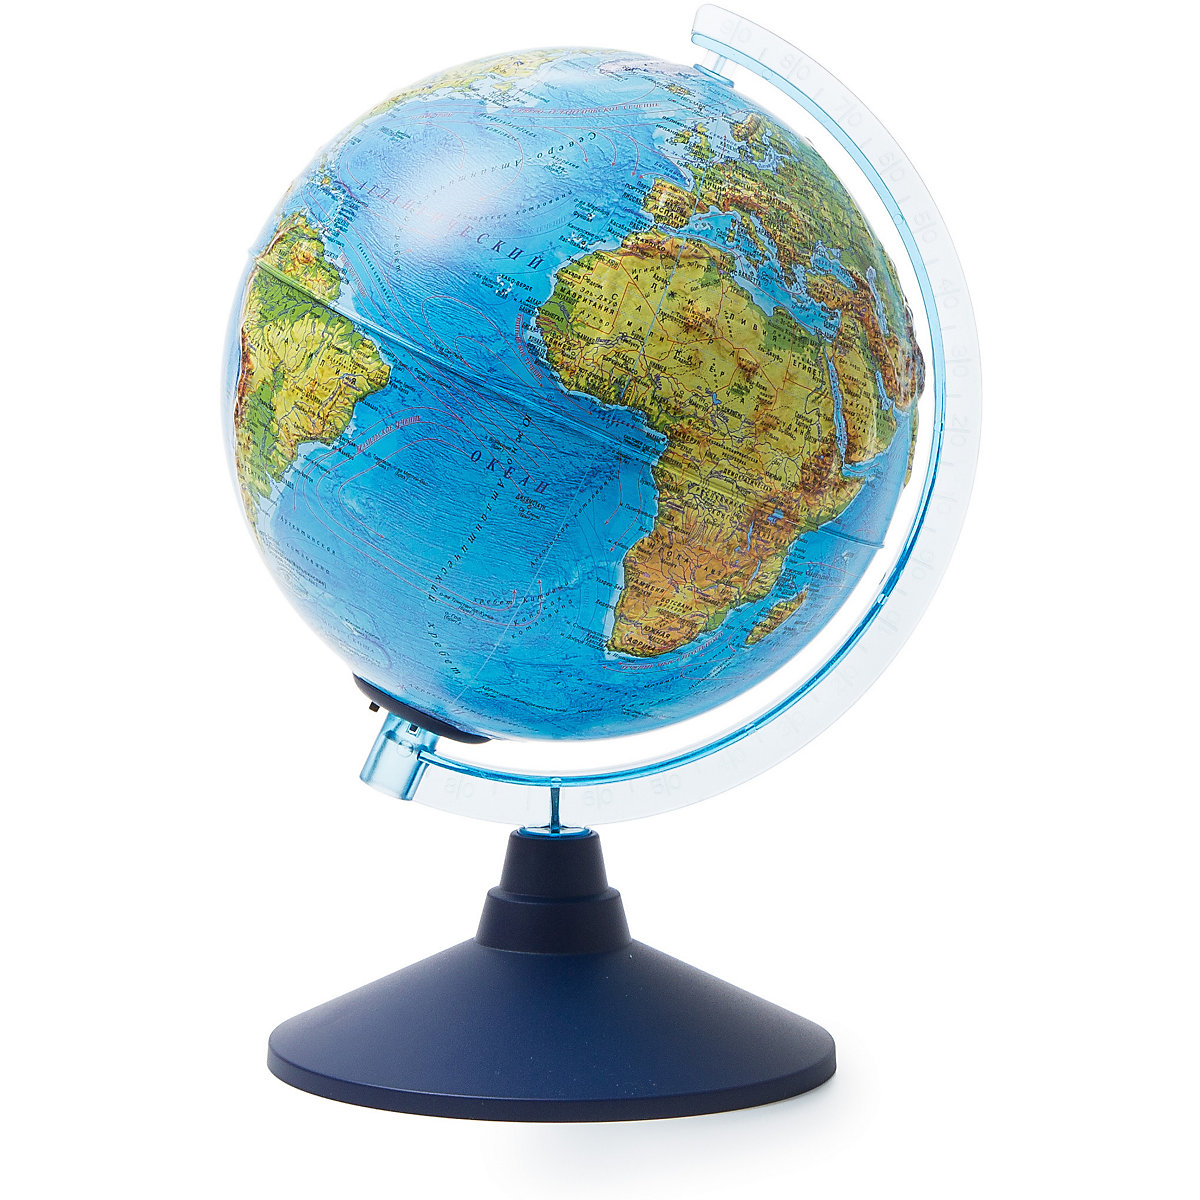 GLOBEN Desk Set 8075083 globe Accessories Organizer for office and school schools offices MTpromo globen desk set 7327225 globe accessories organizer for office and school schools offices